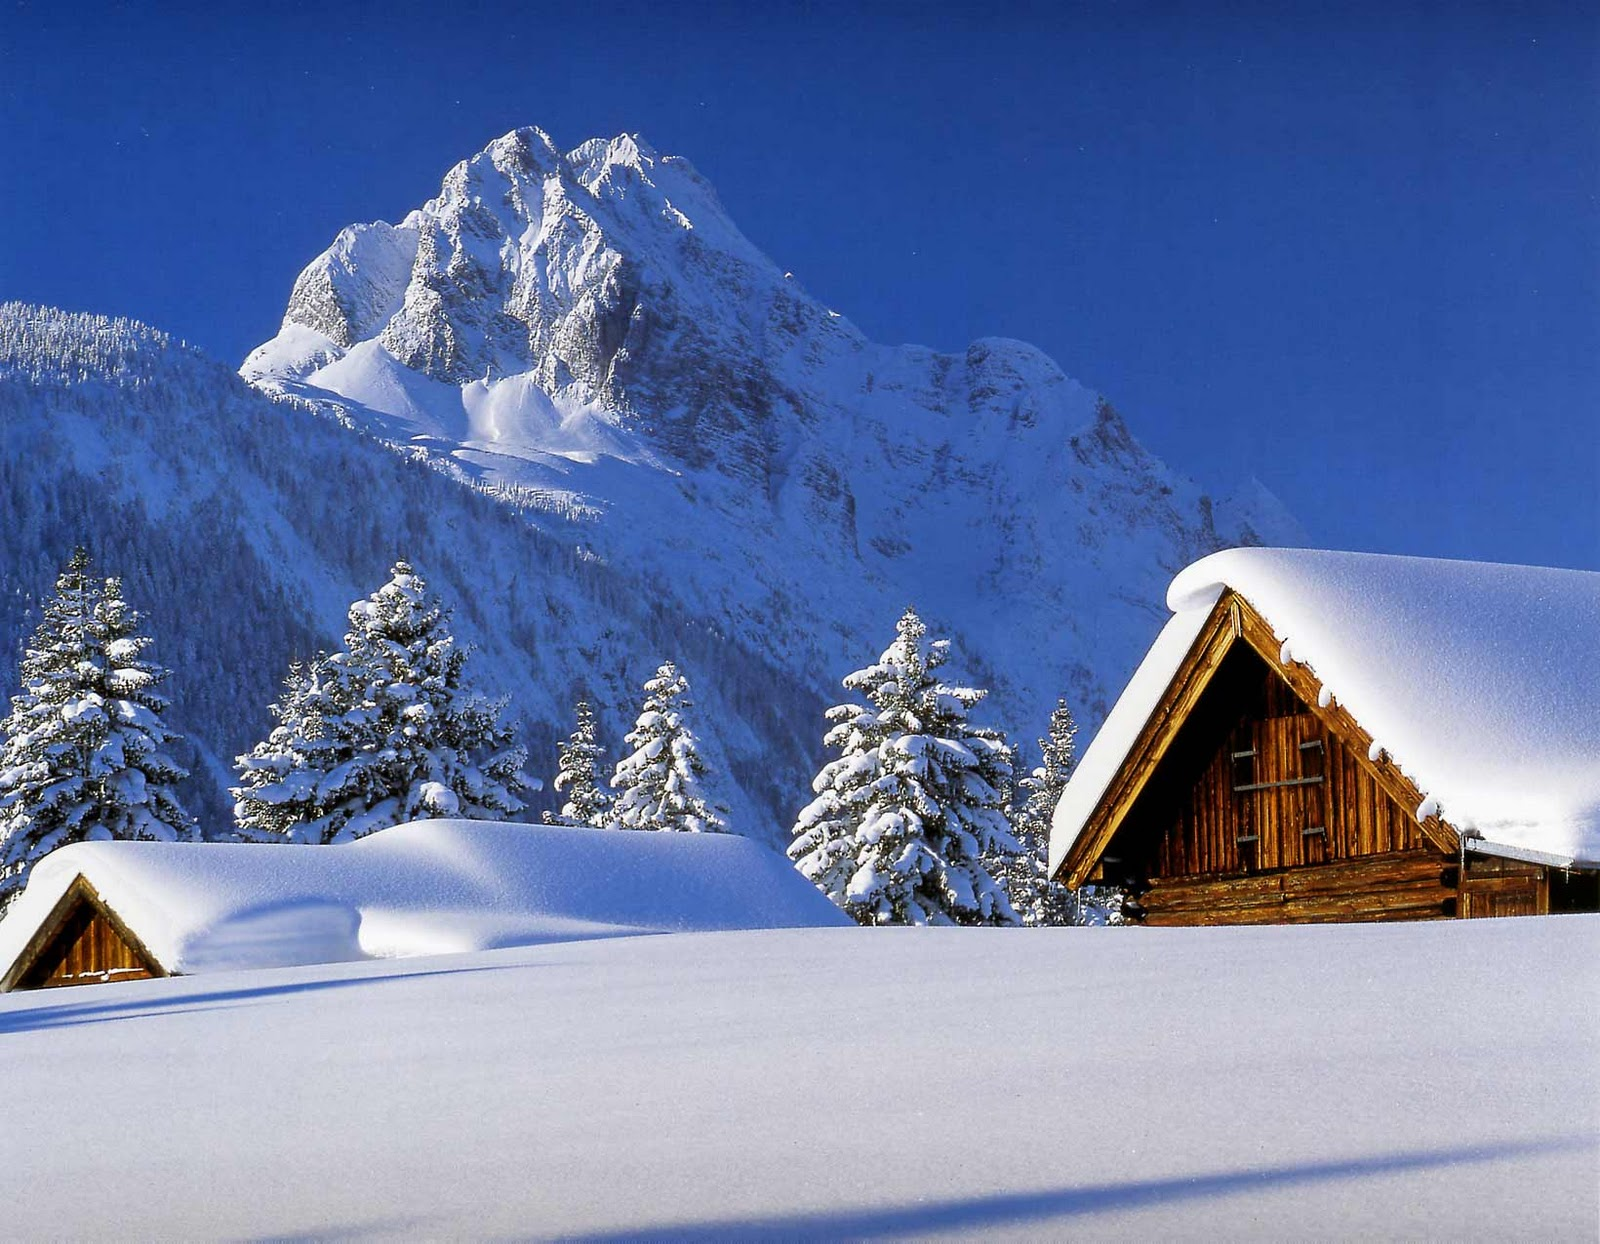 Winter nature wallpaper desktop free desktop wallpaper - Winter desktop ...